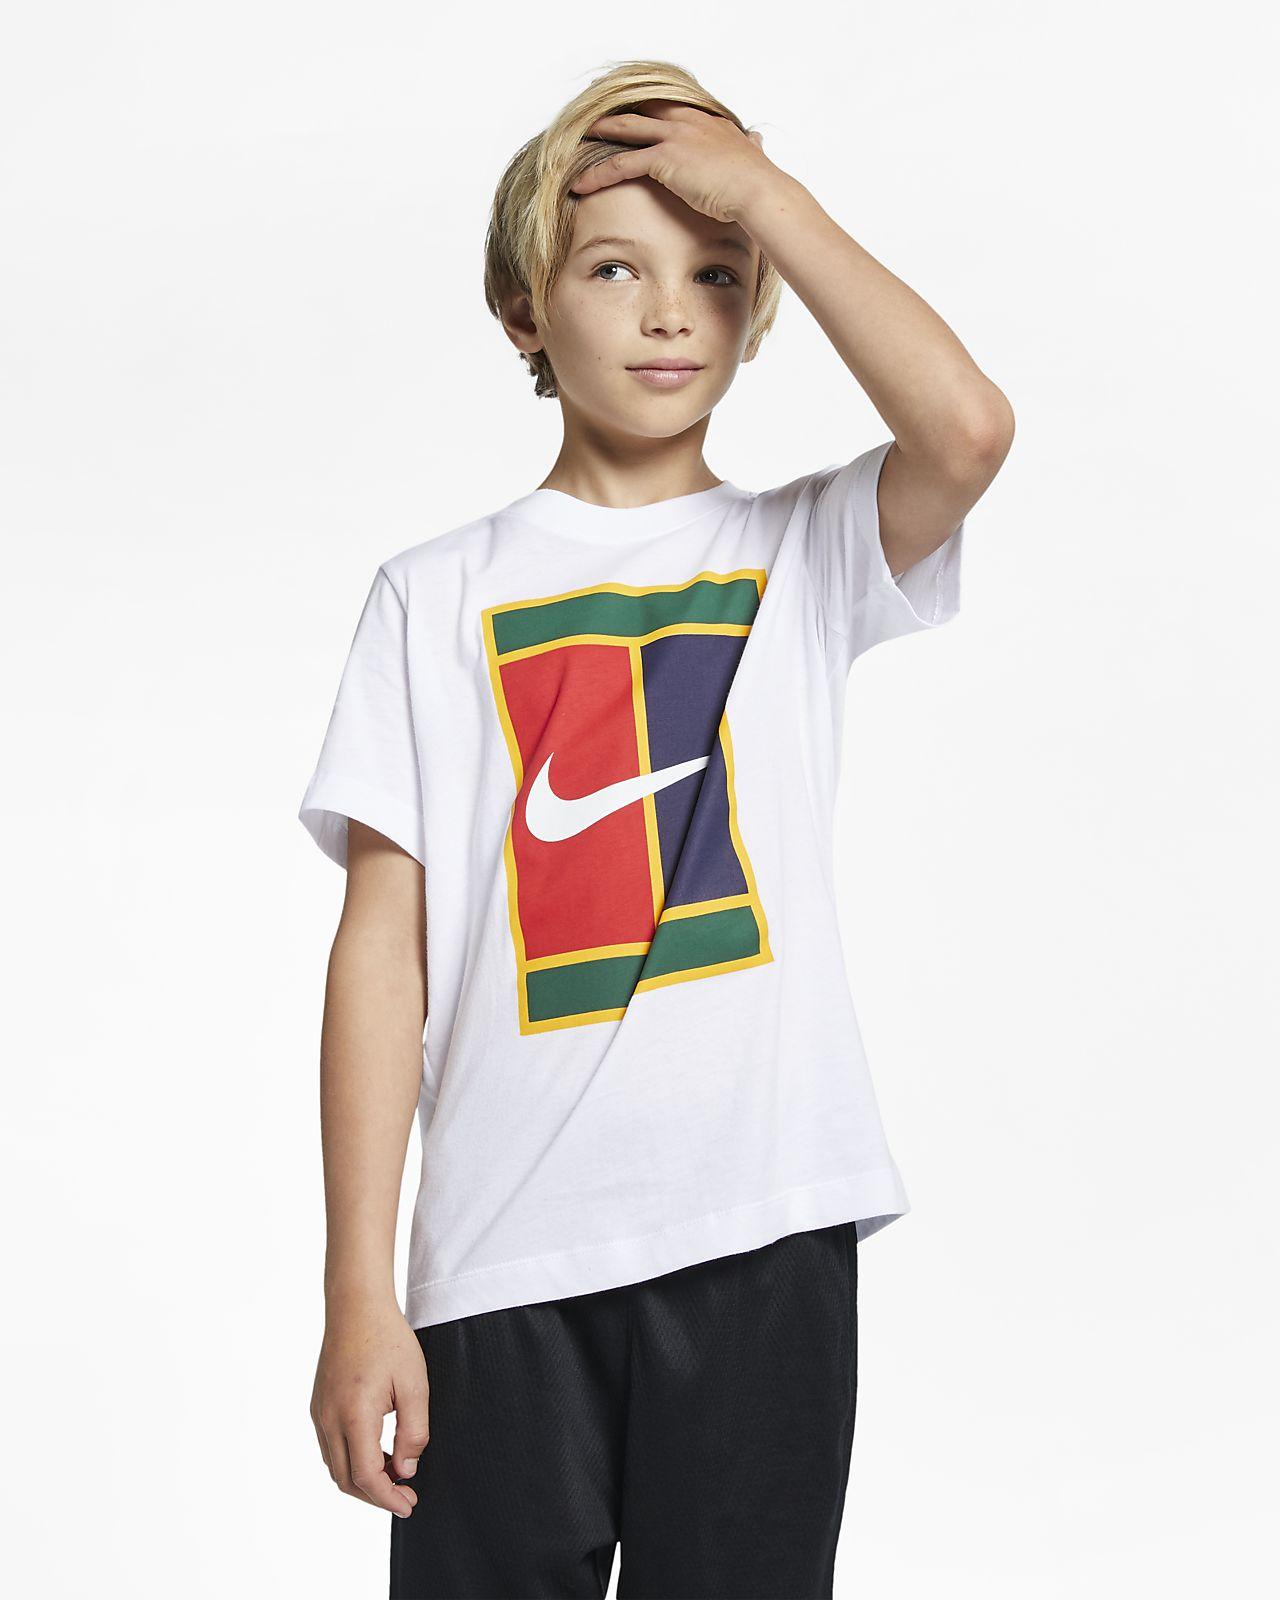 f39a9fee56ad9 Playera de tenis para niño talla grande NikeCourt. Nike.com CL